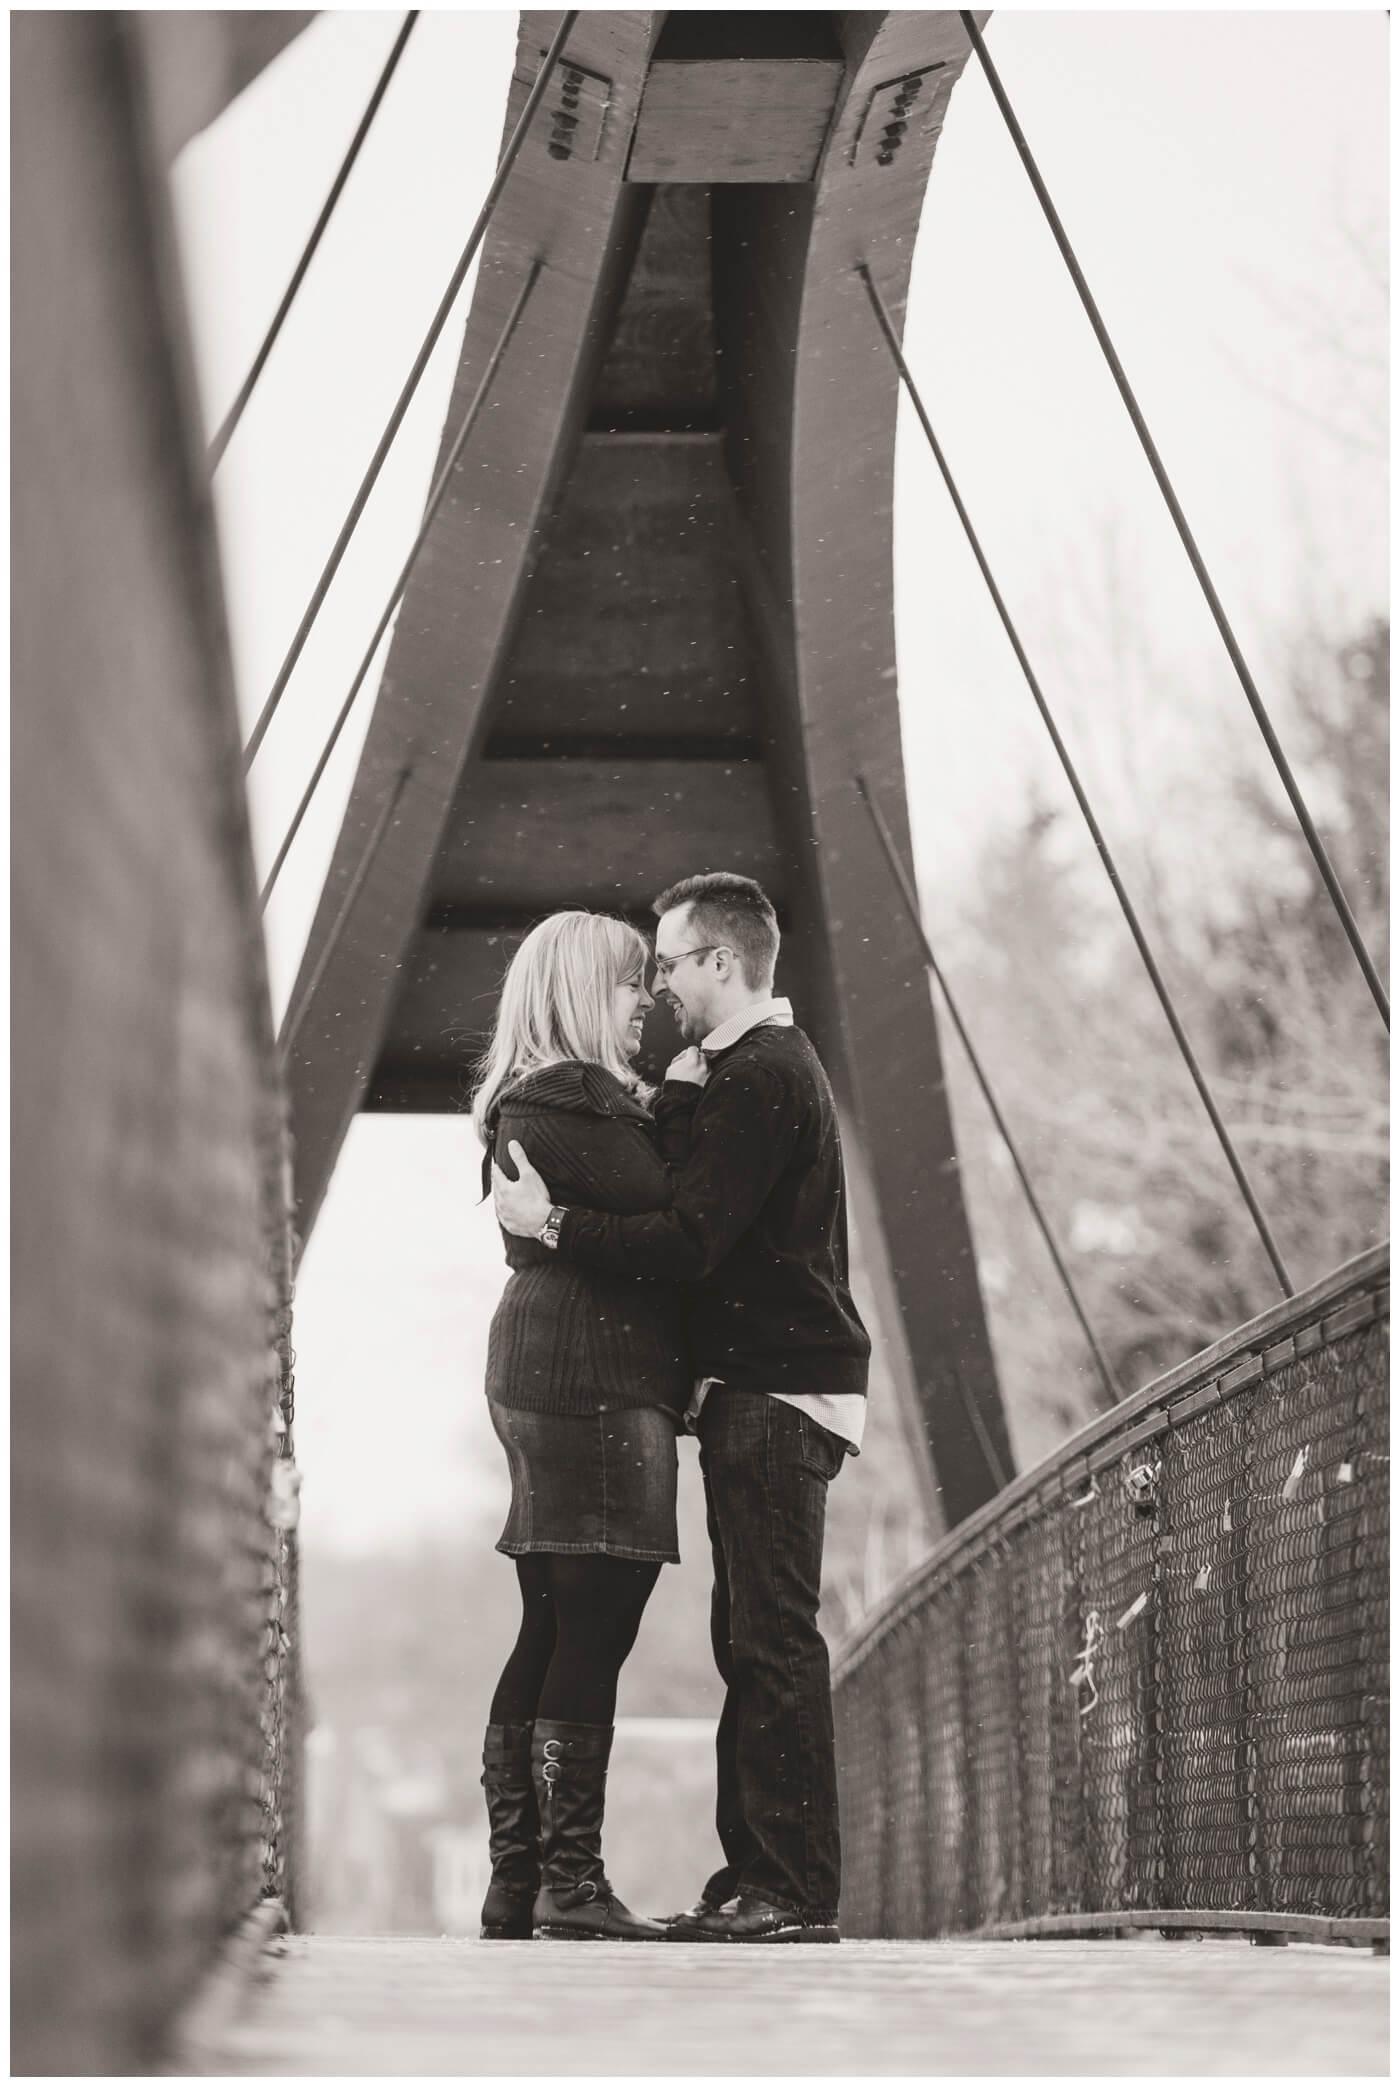 Regina Engagement Photographer - Dave-Sarah - Winter Engagement Session - Rotary Bridge